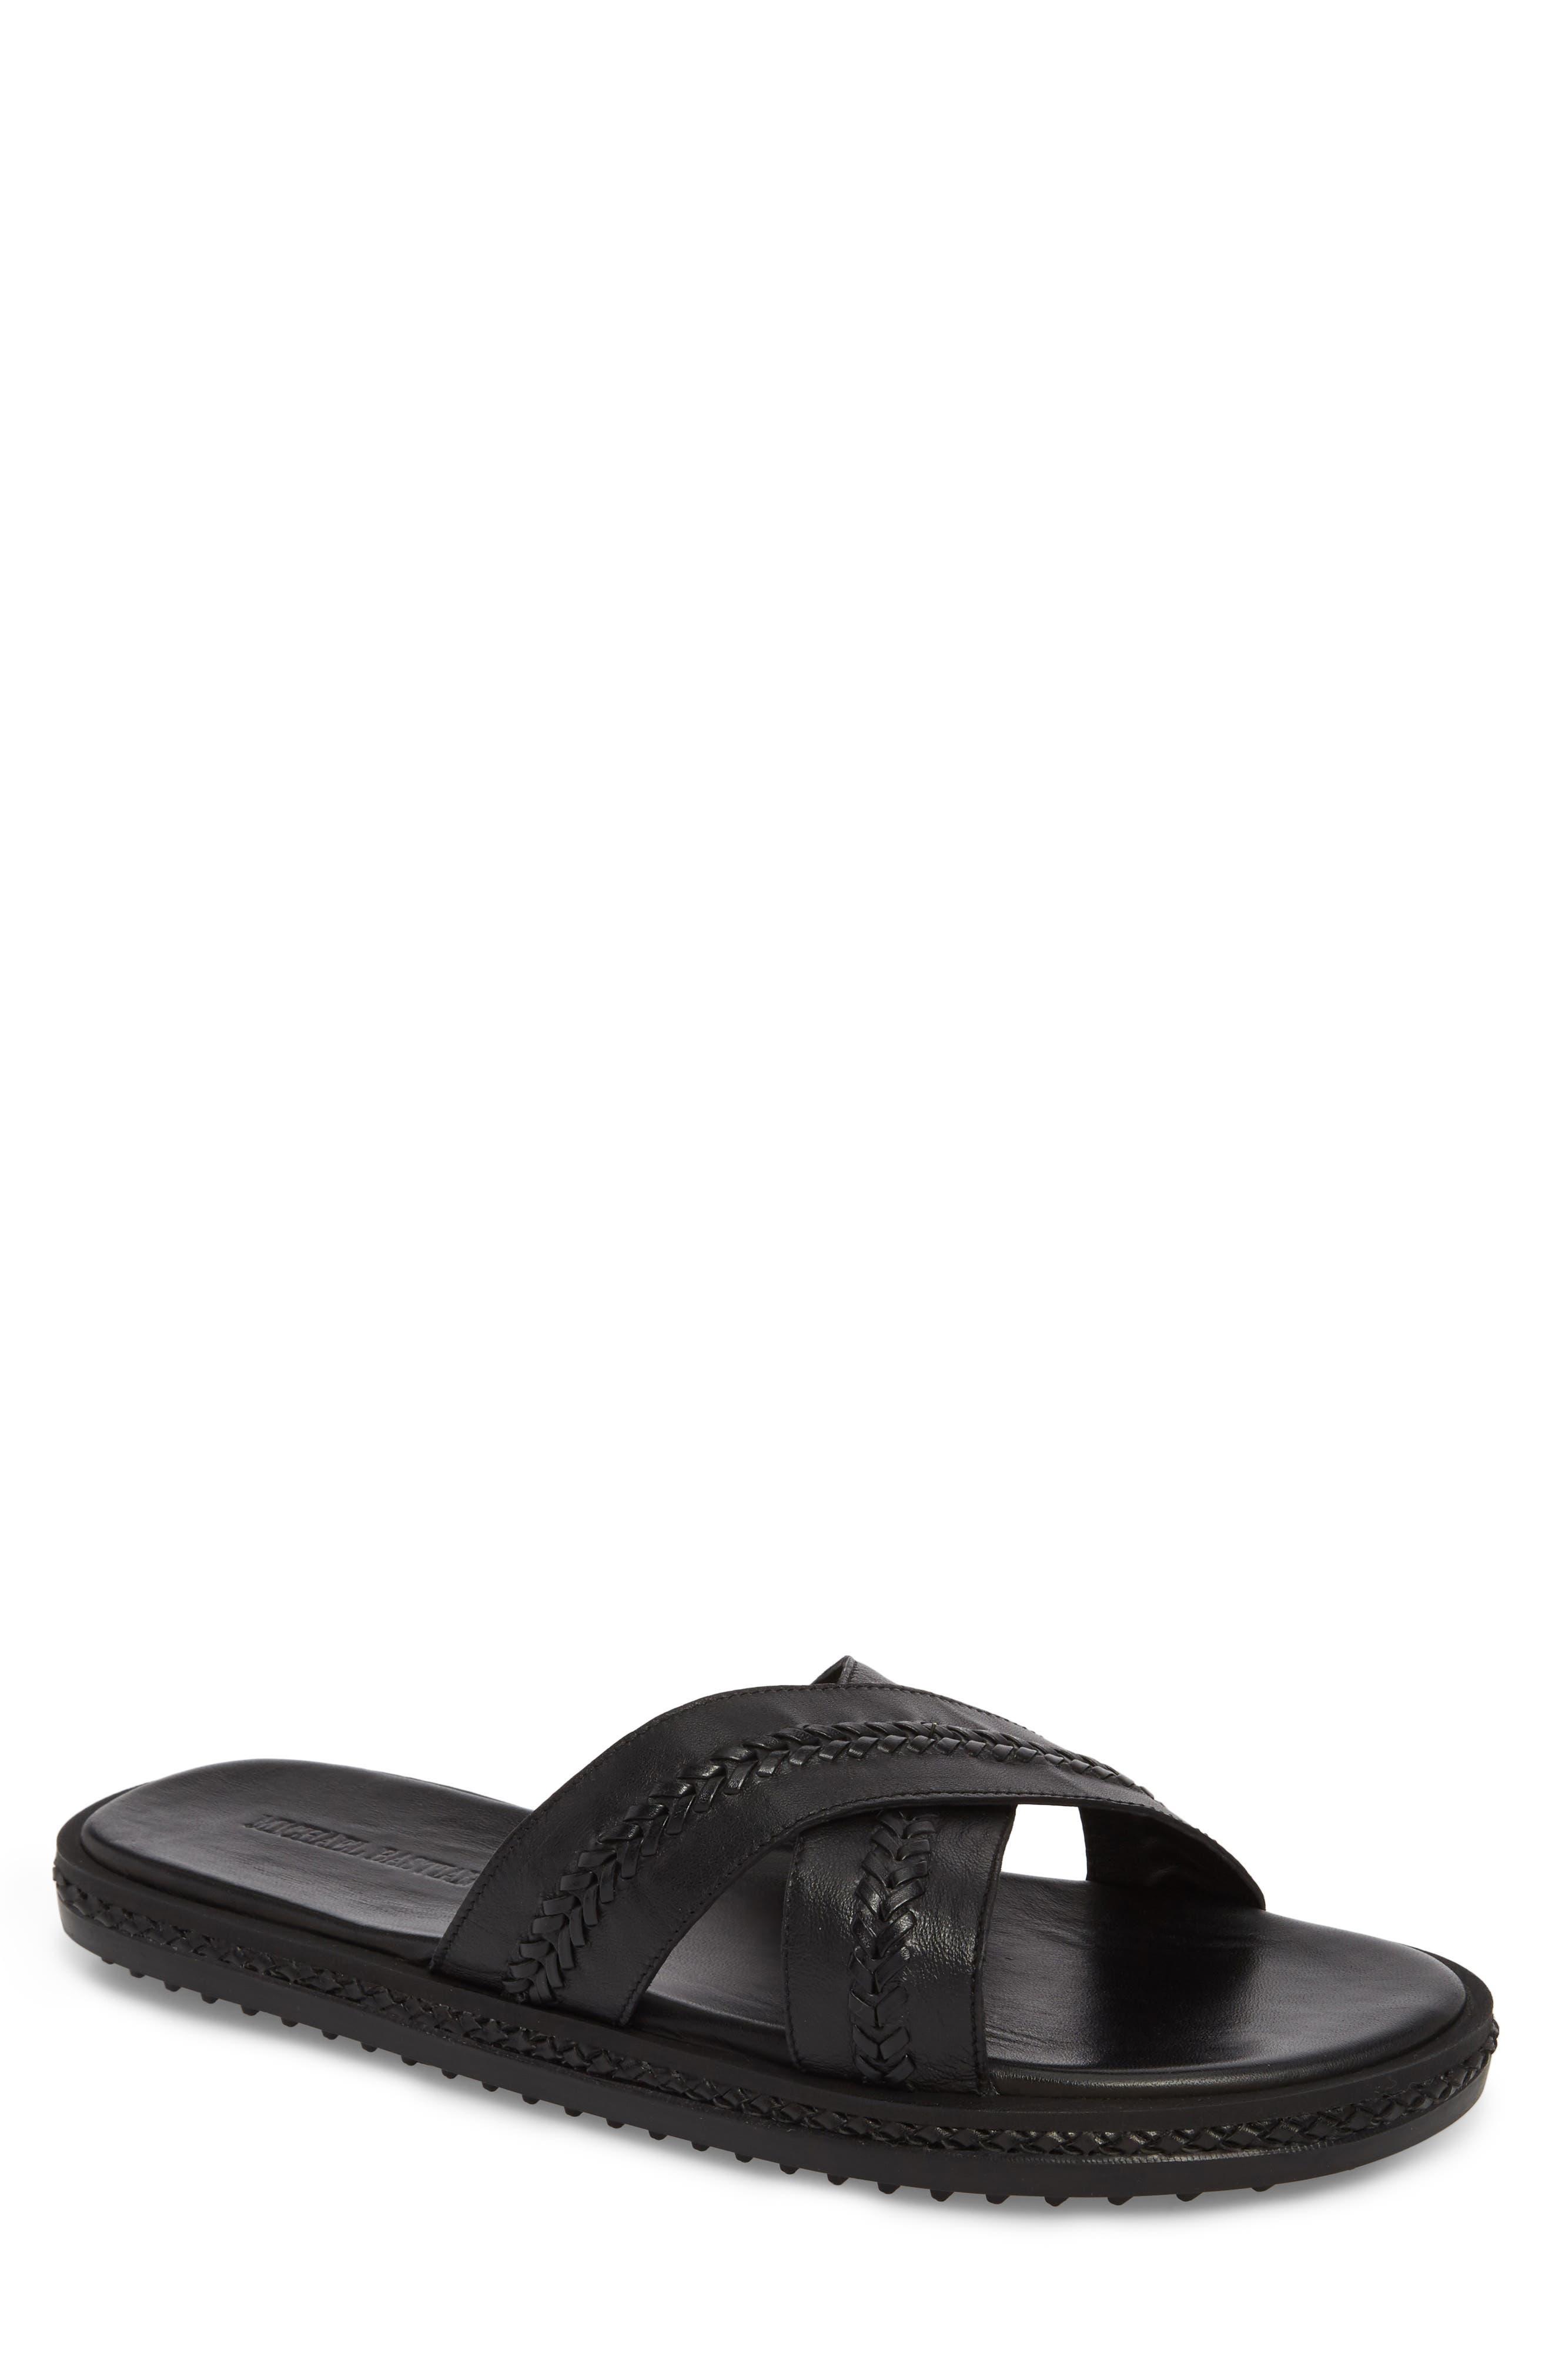 Woven Cross Strap Slide Sandal,                         Main,                         color, Black Leather